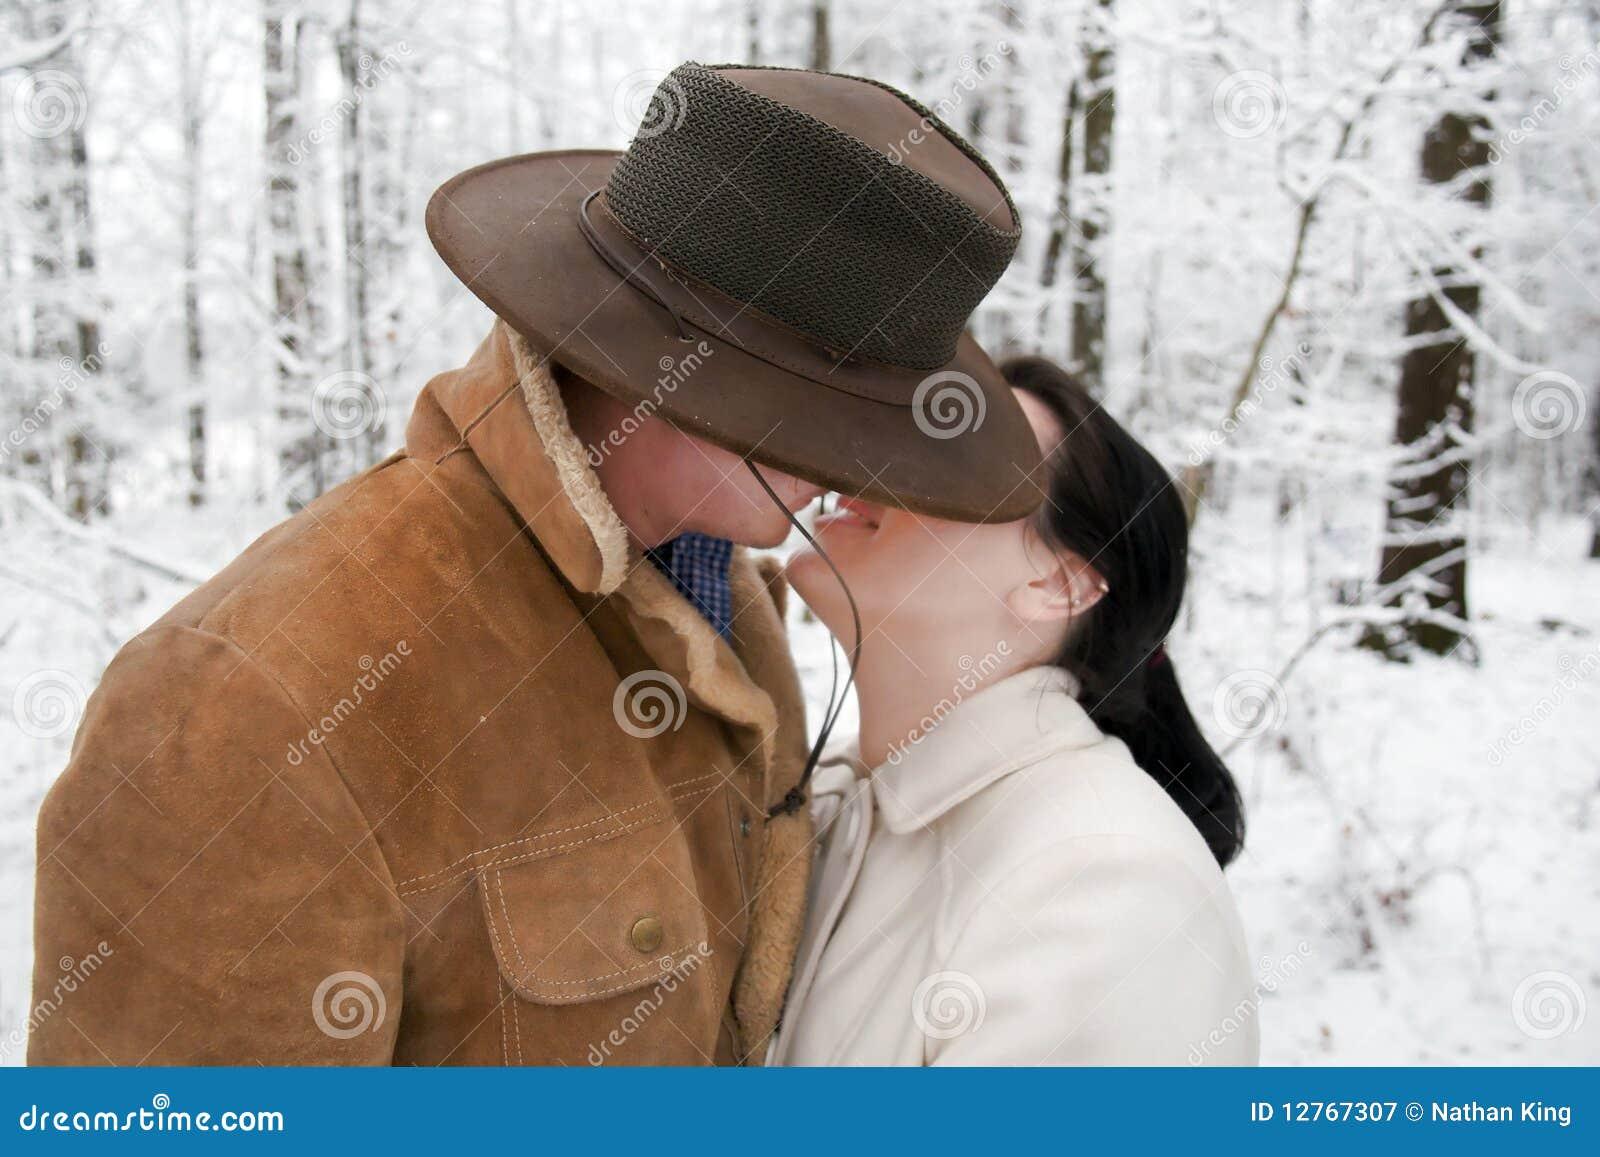 Cute Western Couple